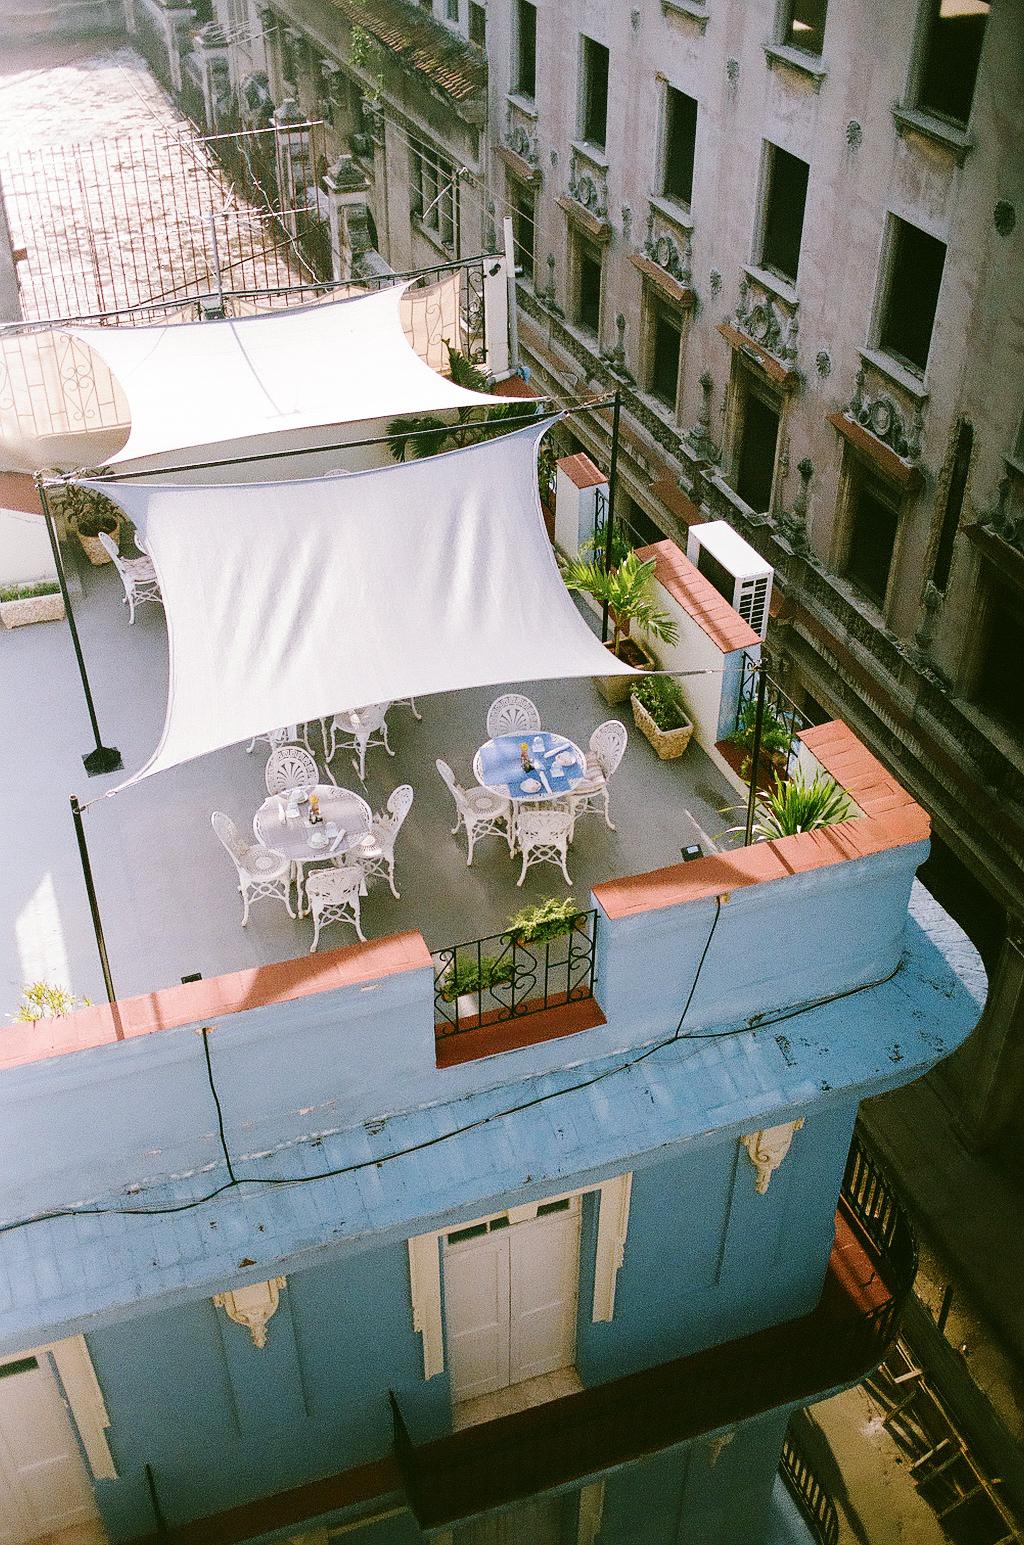 Havana on Film  |  LITTLE HENRY LEE